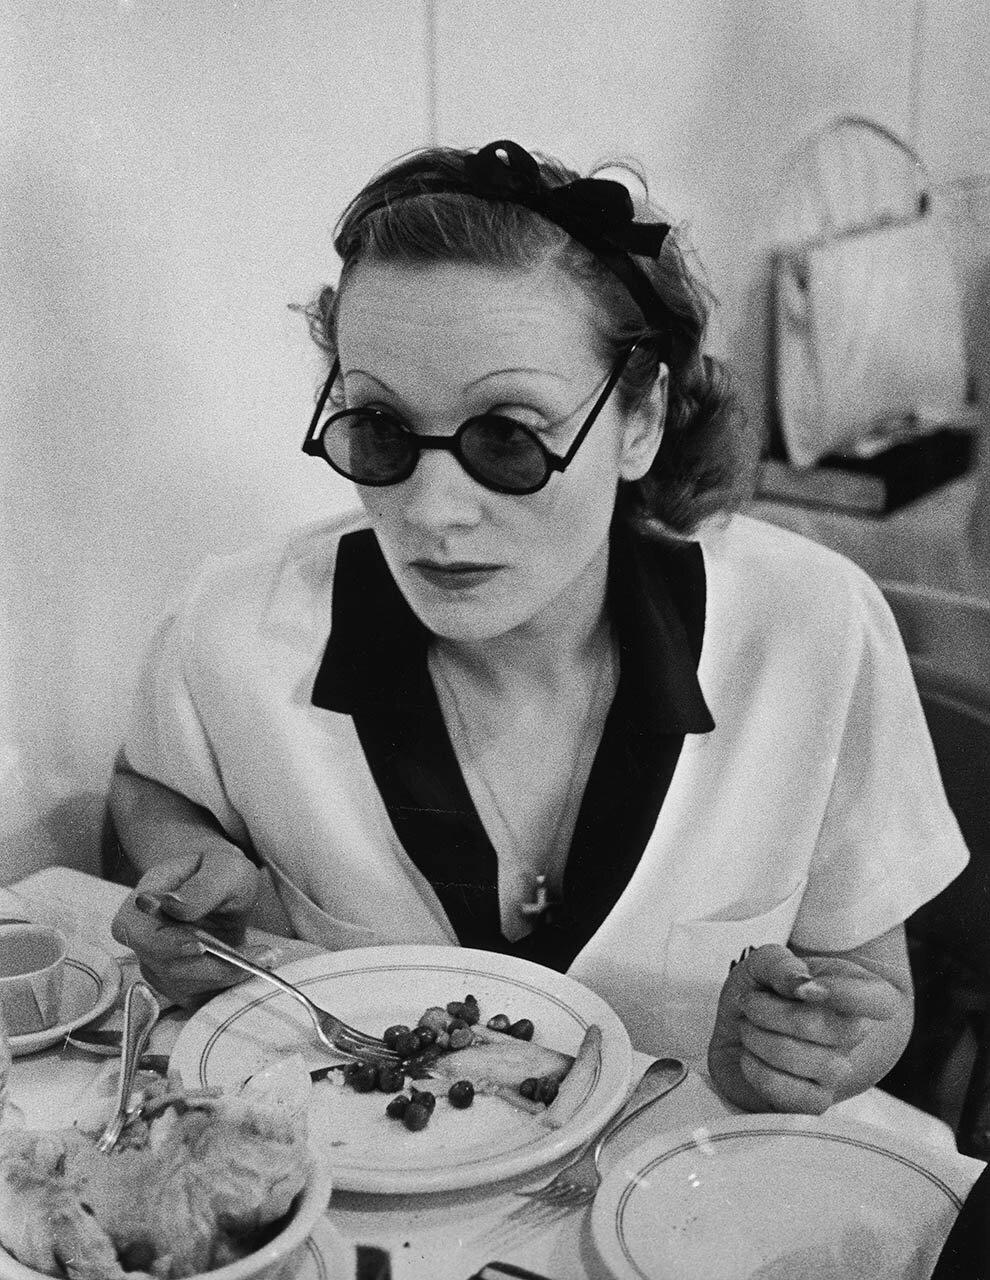 1938. Марлен Дитрих обедает на студии Парамаунт